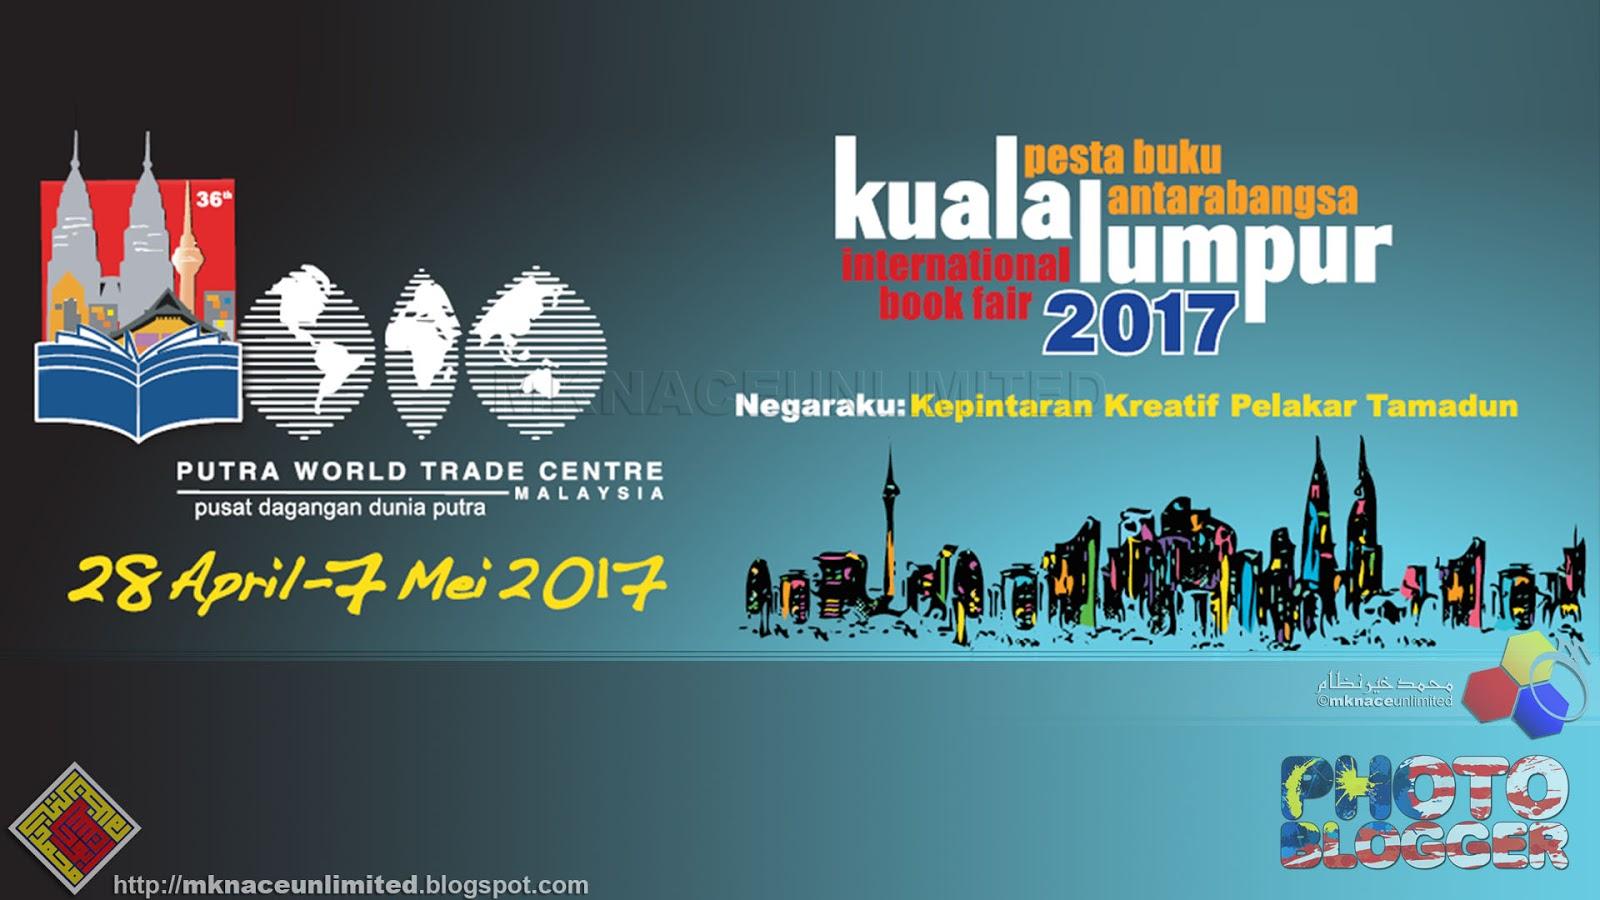 Pesta Buku Antarabangsa Kuala Lumpur 2017